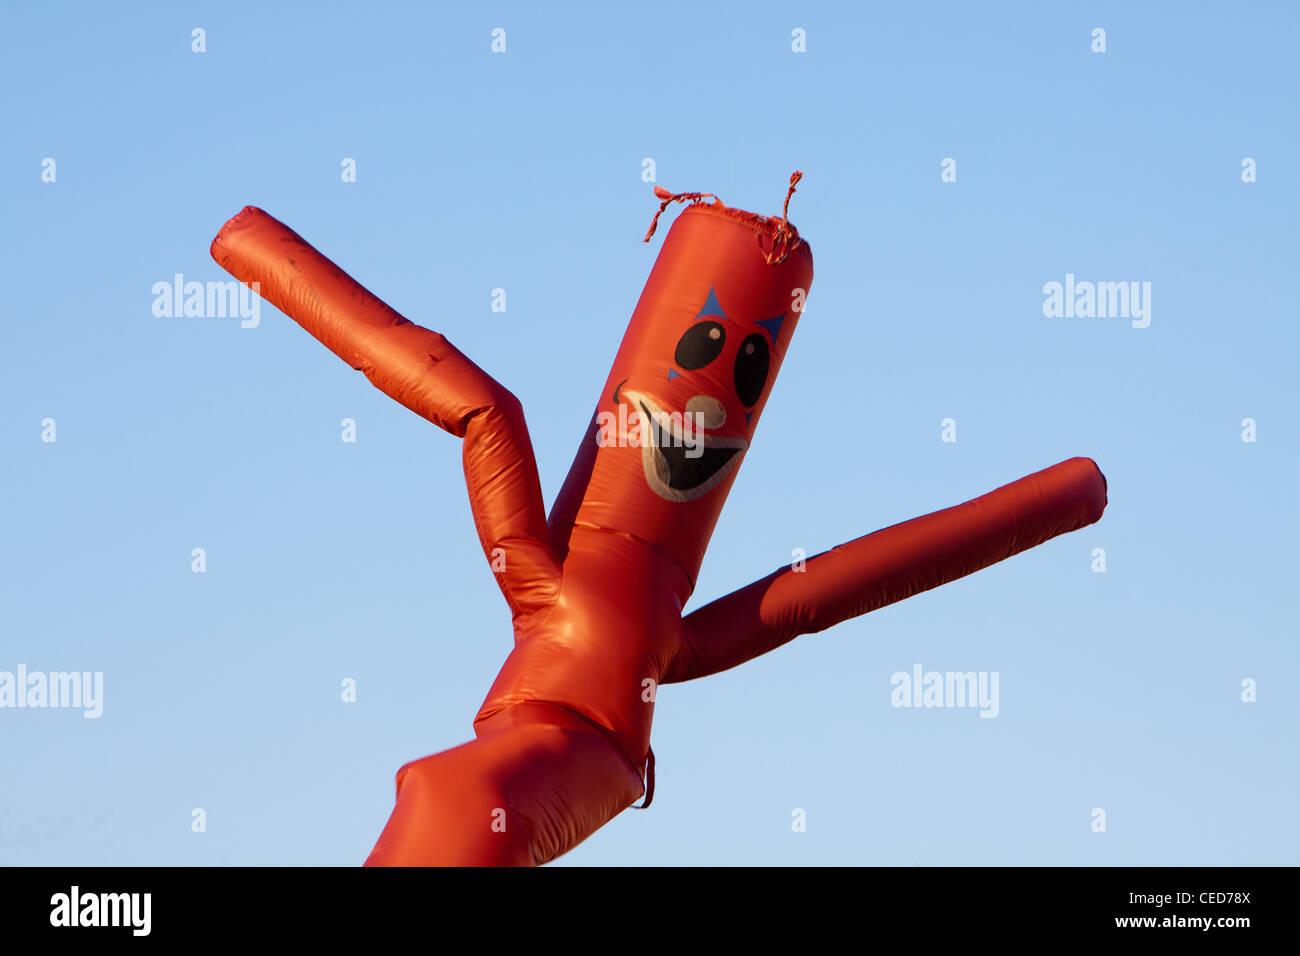 A Wacky Waving Inflatable Arm Flailing Tube Man. - Stock Image